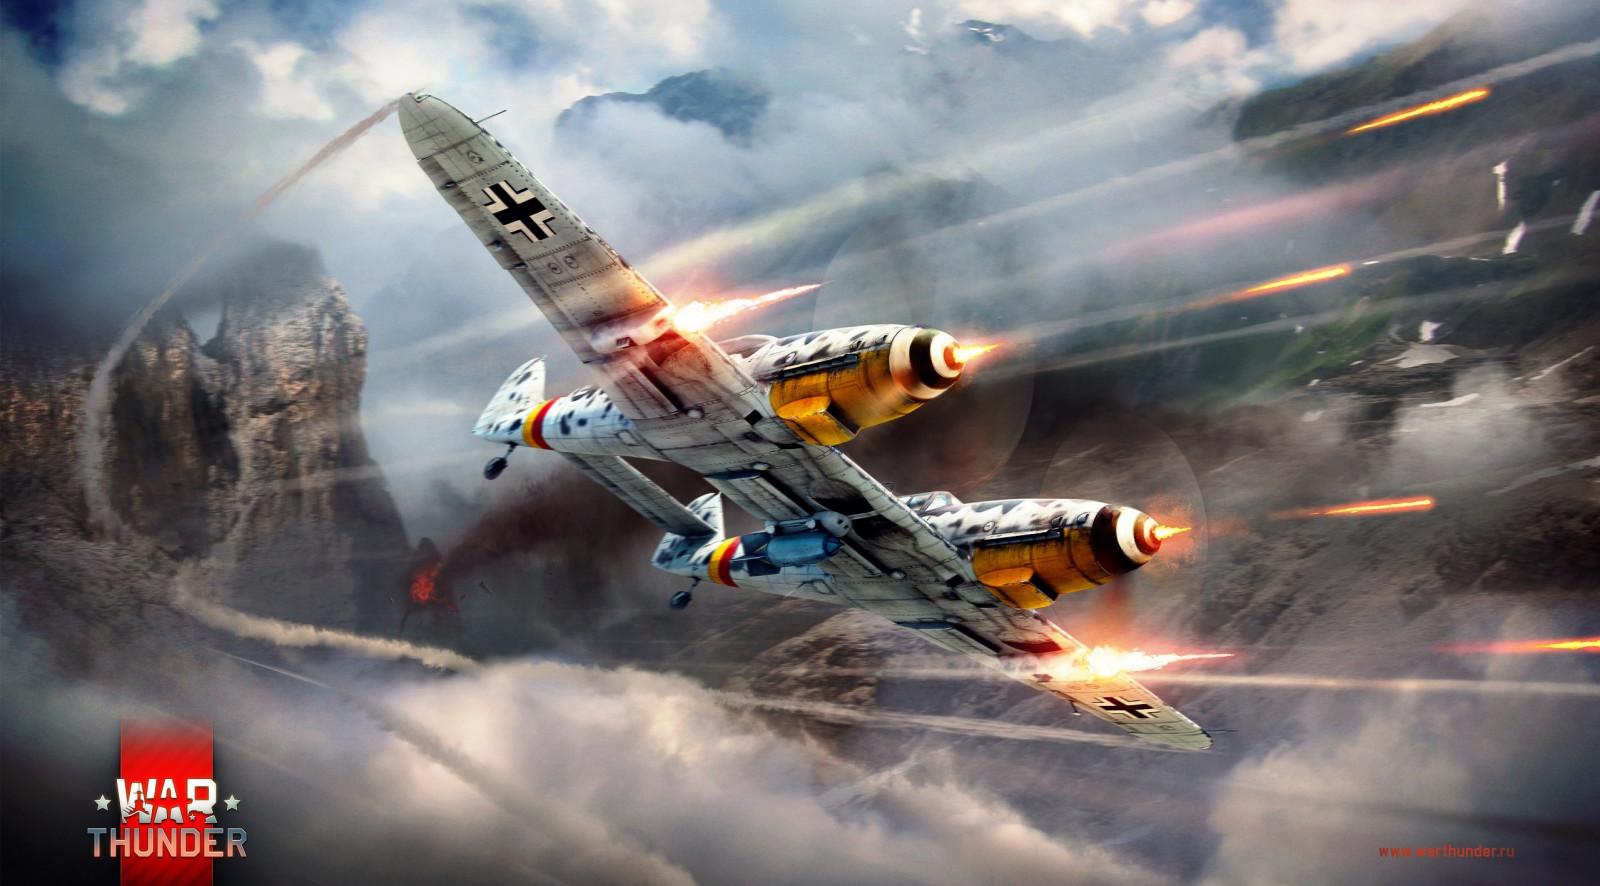 Wallpaper : War Thunder, PC gaming, military aircraft, artwork 2558x1417 - WallpaperManiac ...